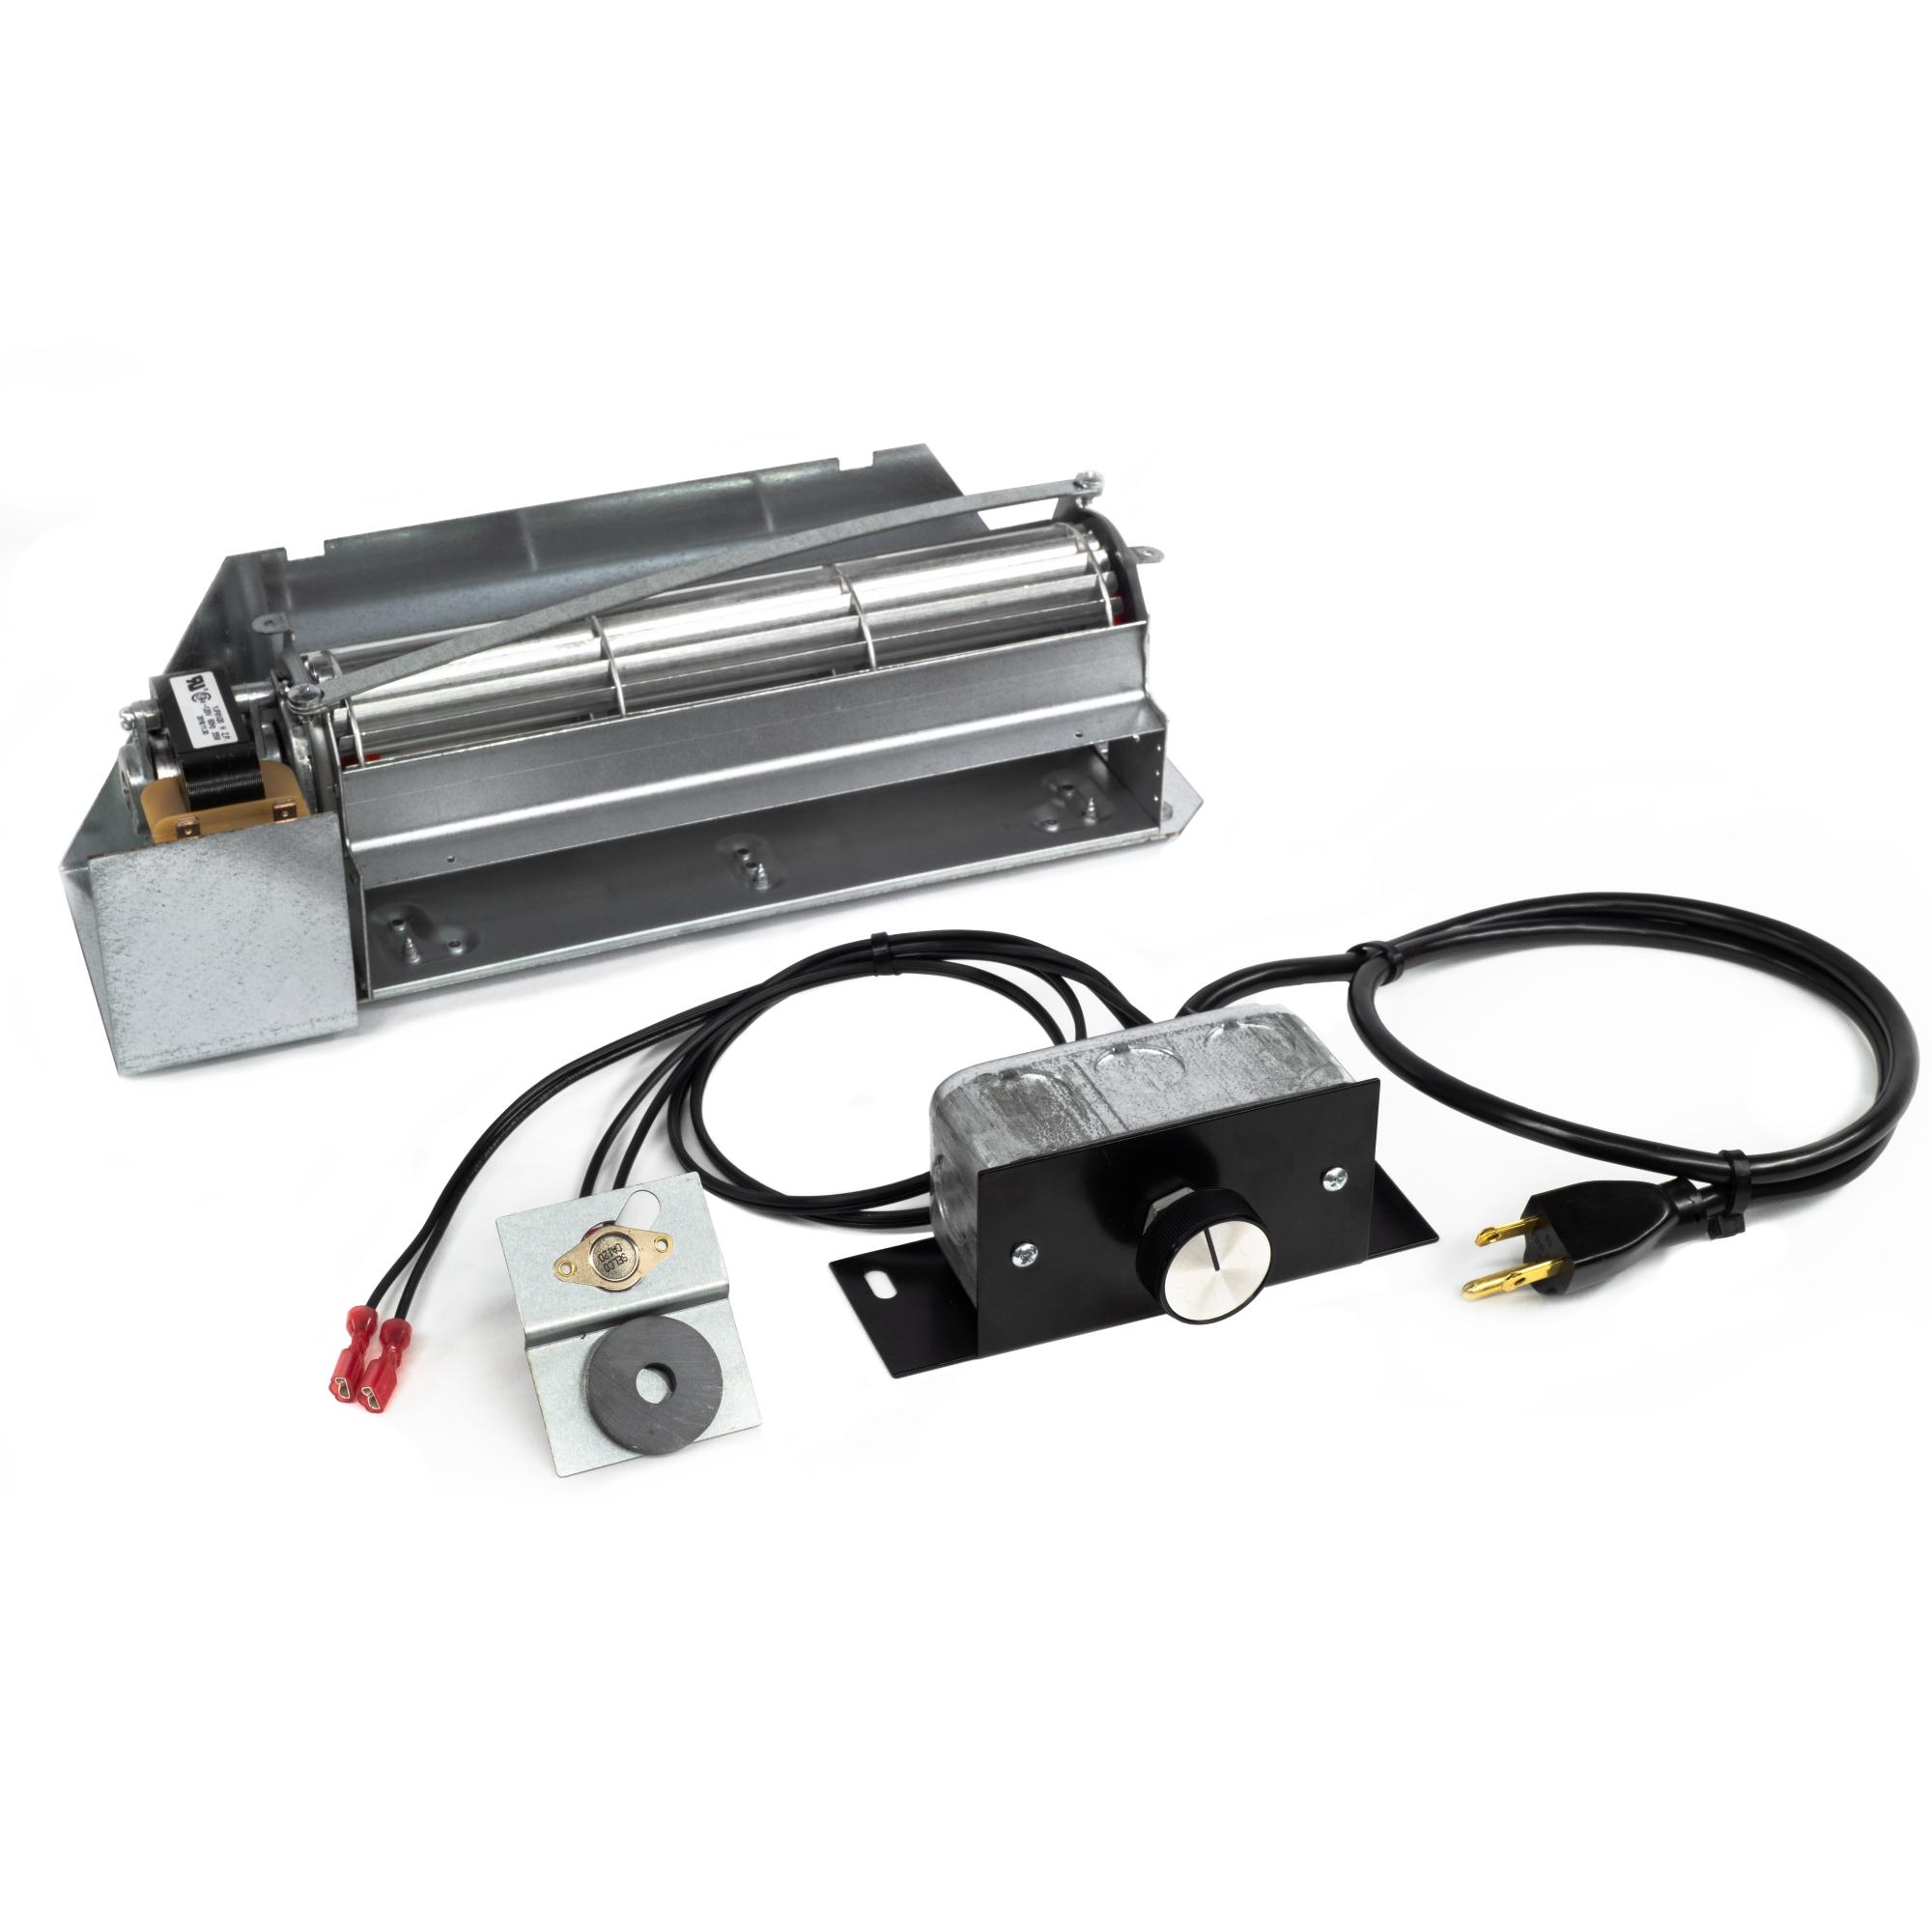 FBK-250 Fireplace Blower Kit for Astria, Lennox & Superior Fireplaces